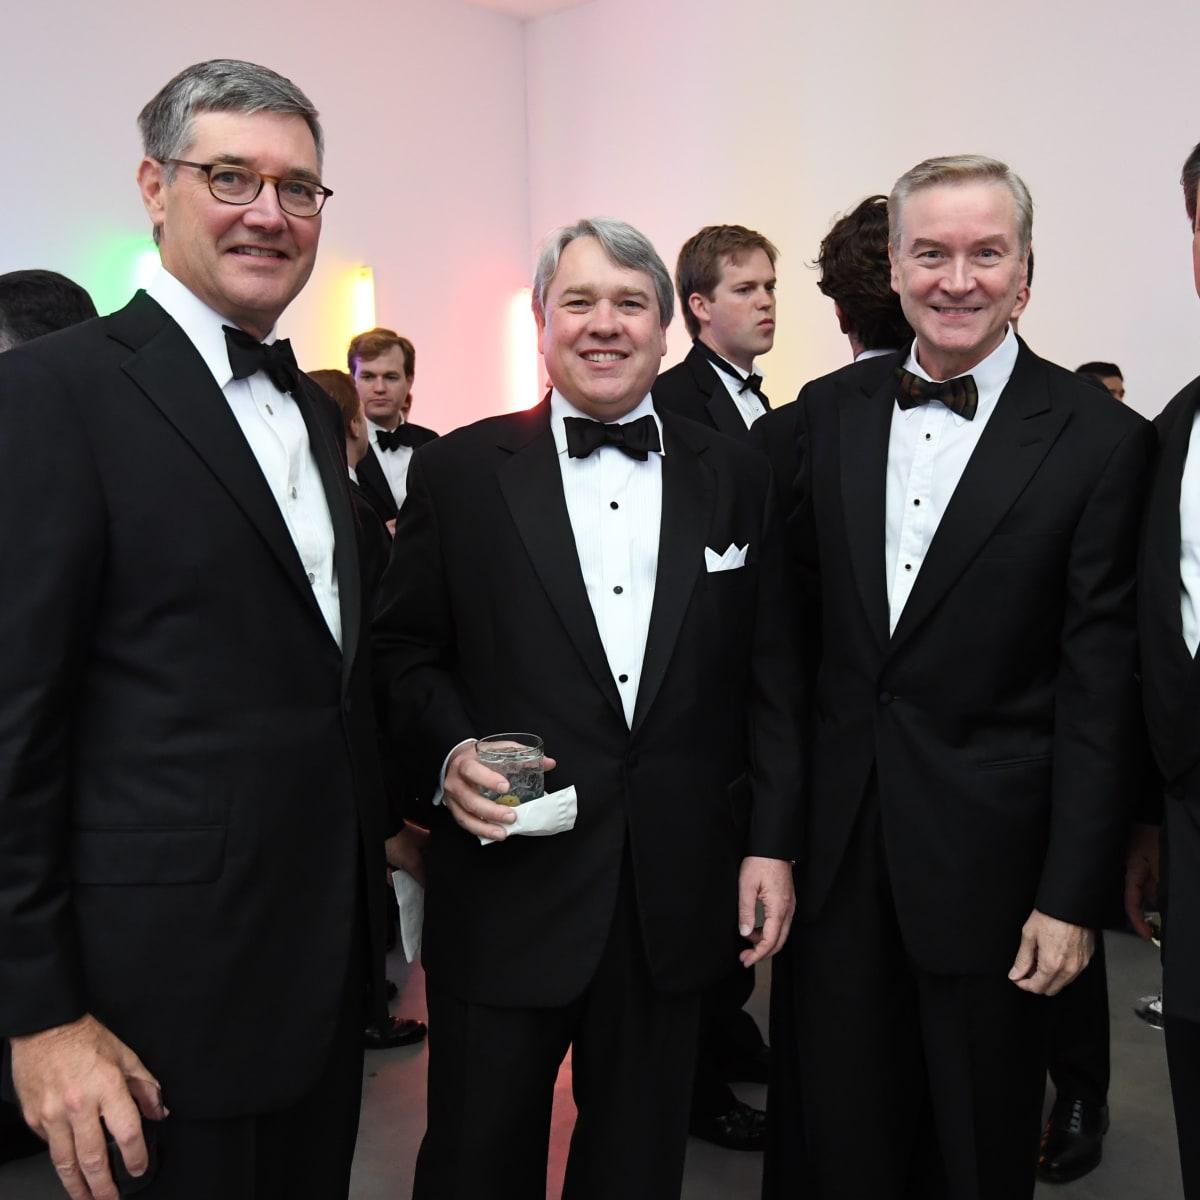 Men of Menil 2016 Bill Curtis, Reggie Smith, David Pustka, and Jim Higgason